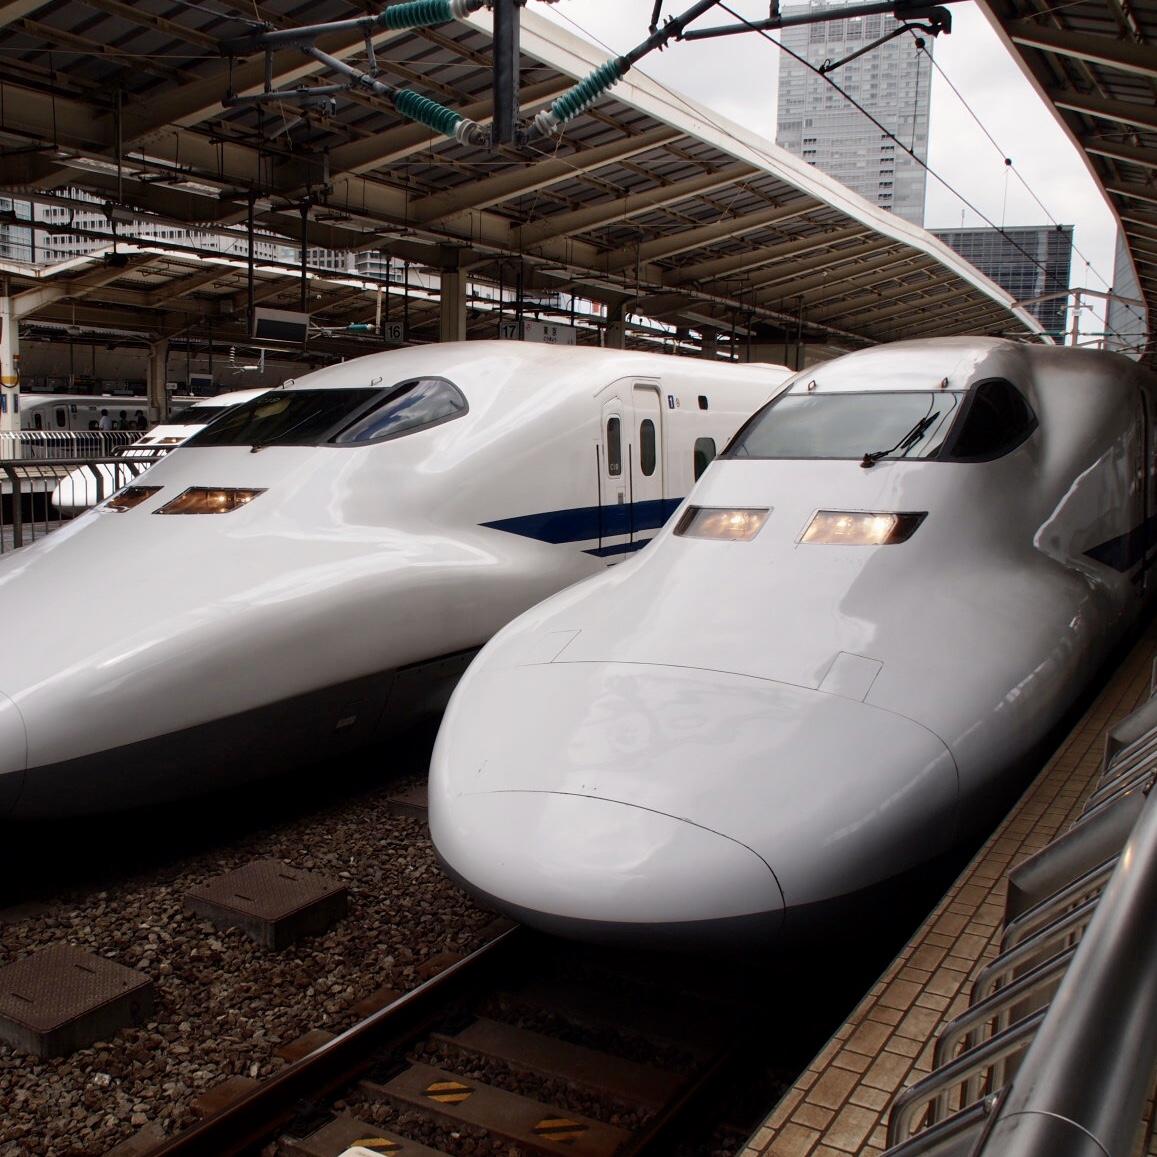 #28 東海道新幹線700系、3月で引退!